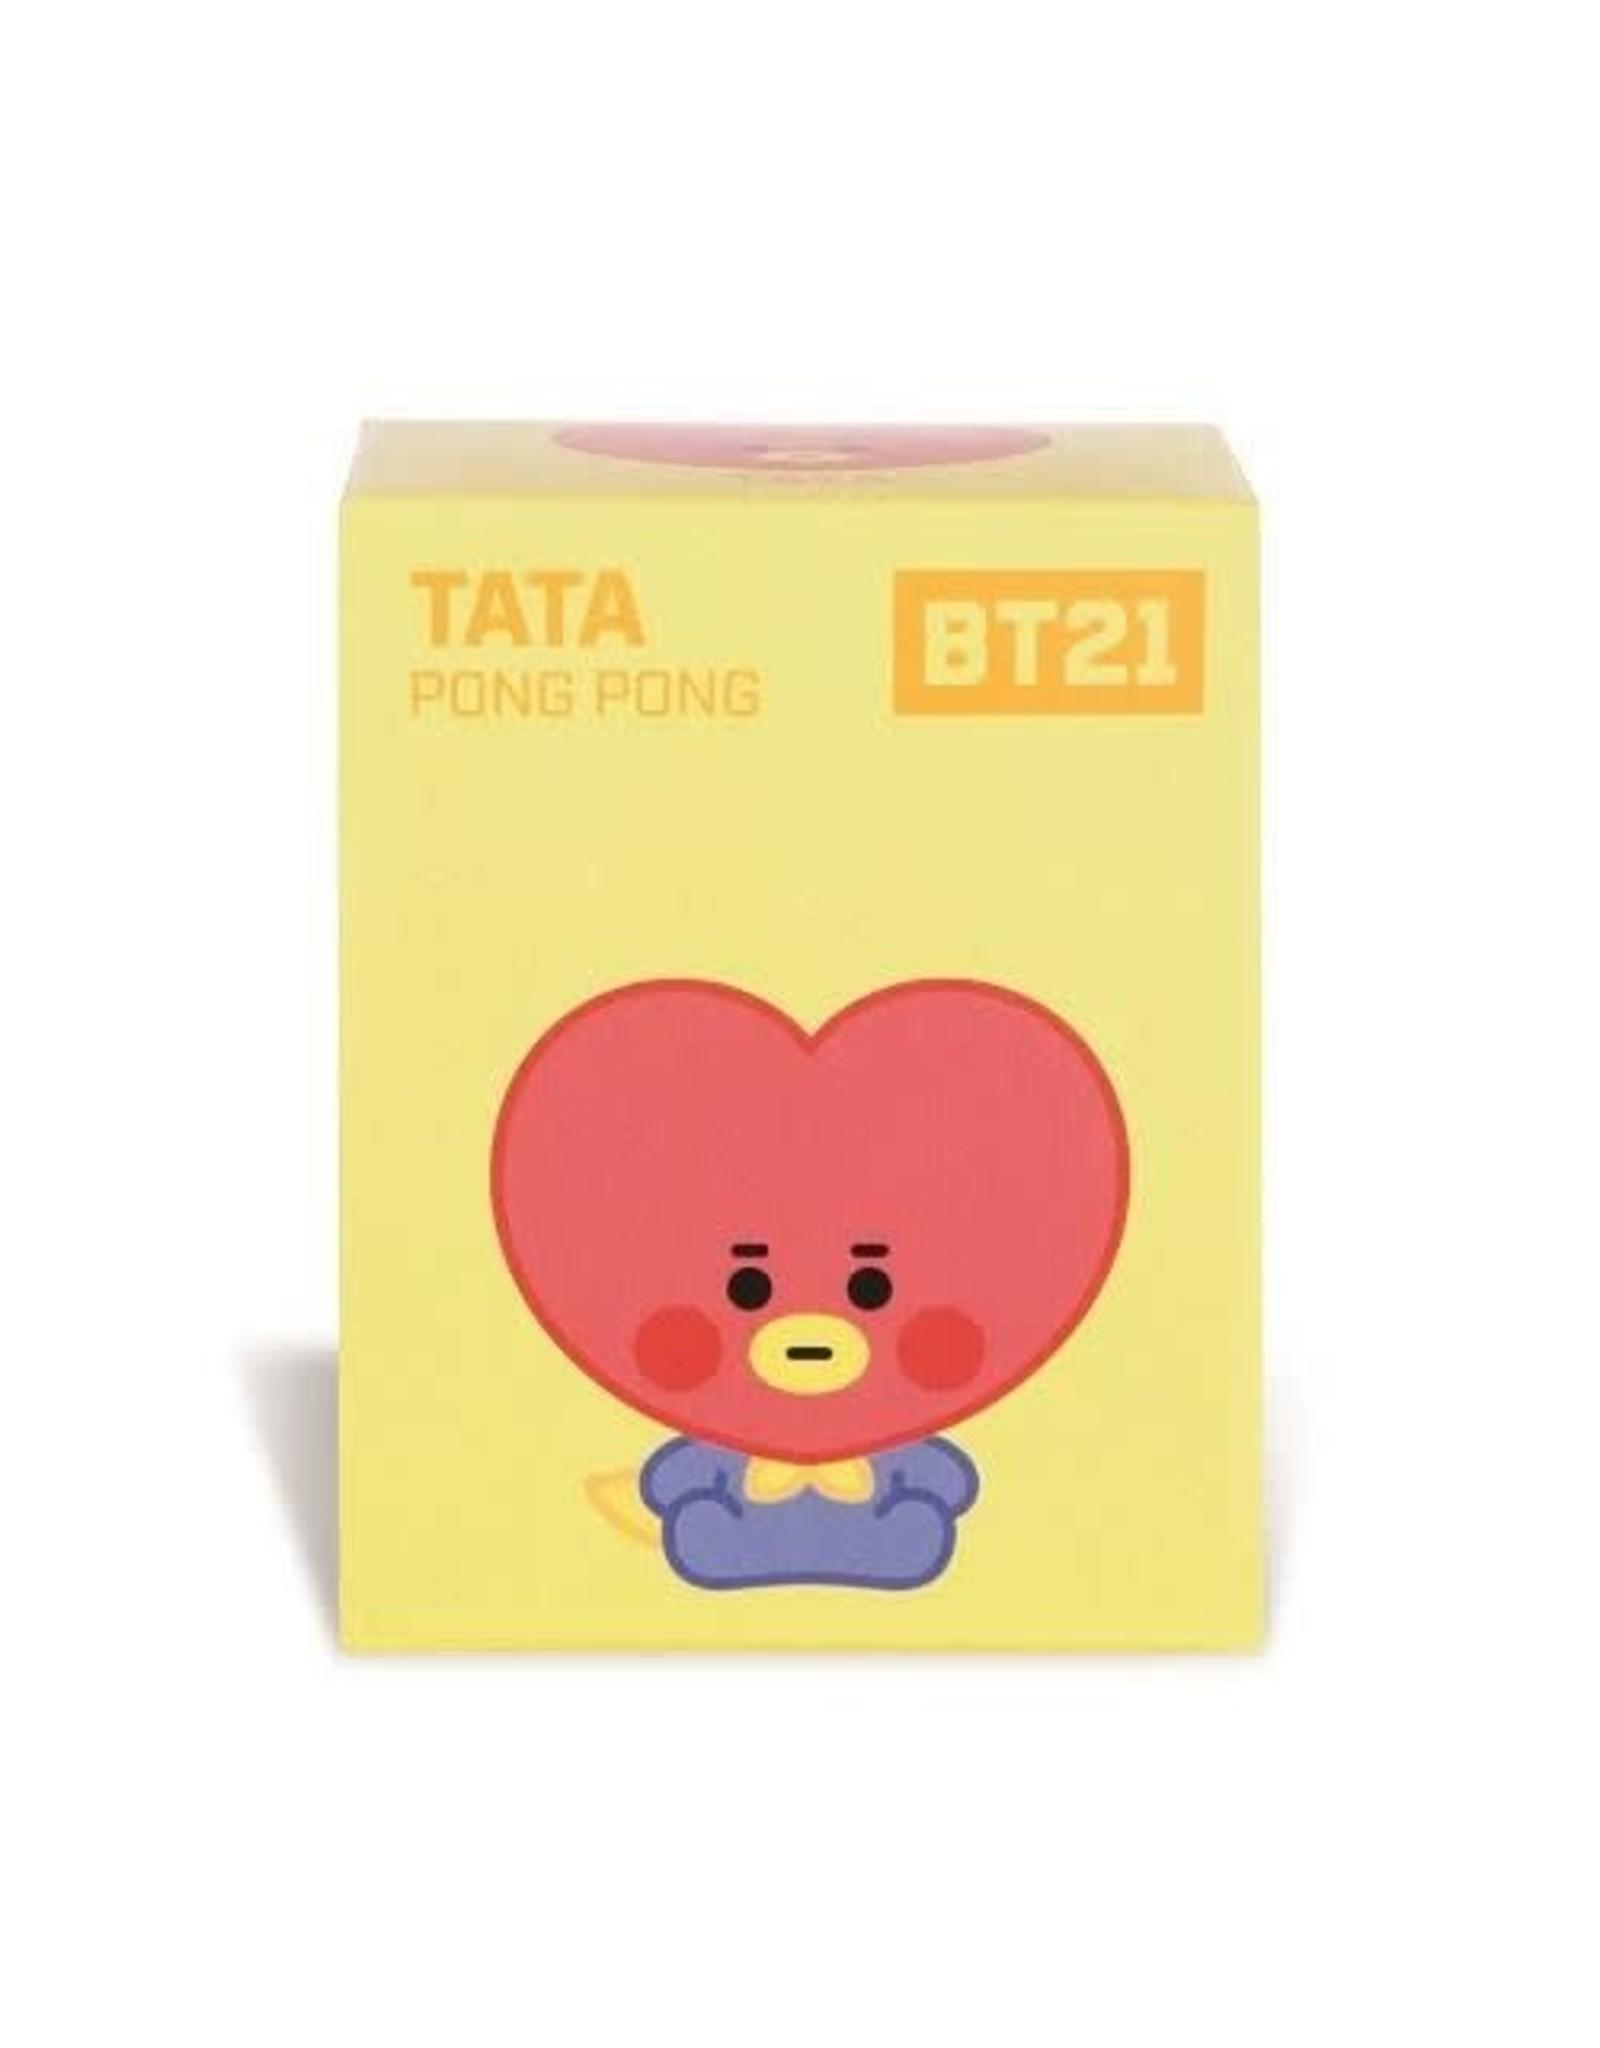 BT21 - Pong Pong Baby Tata - 8 cm